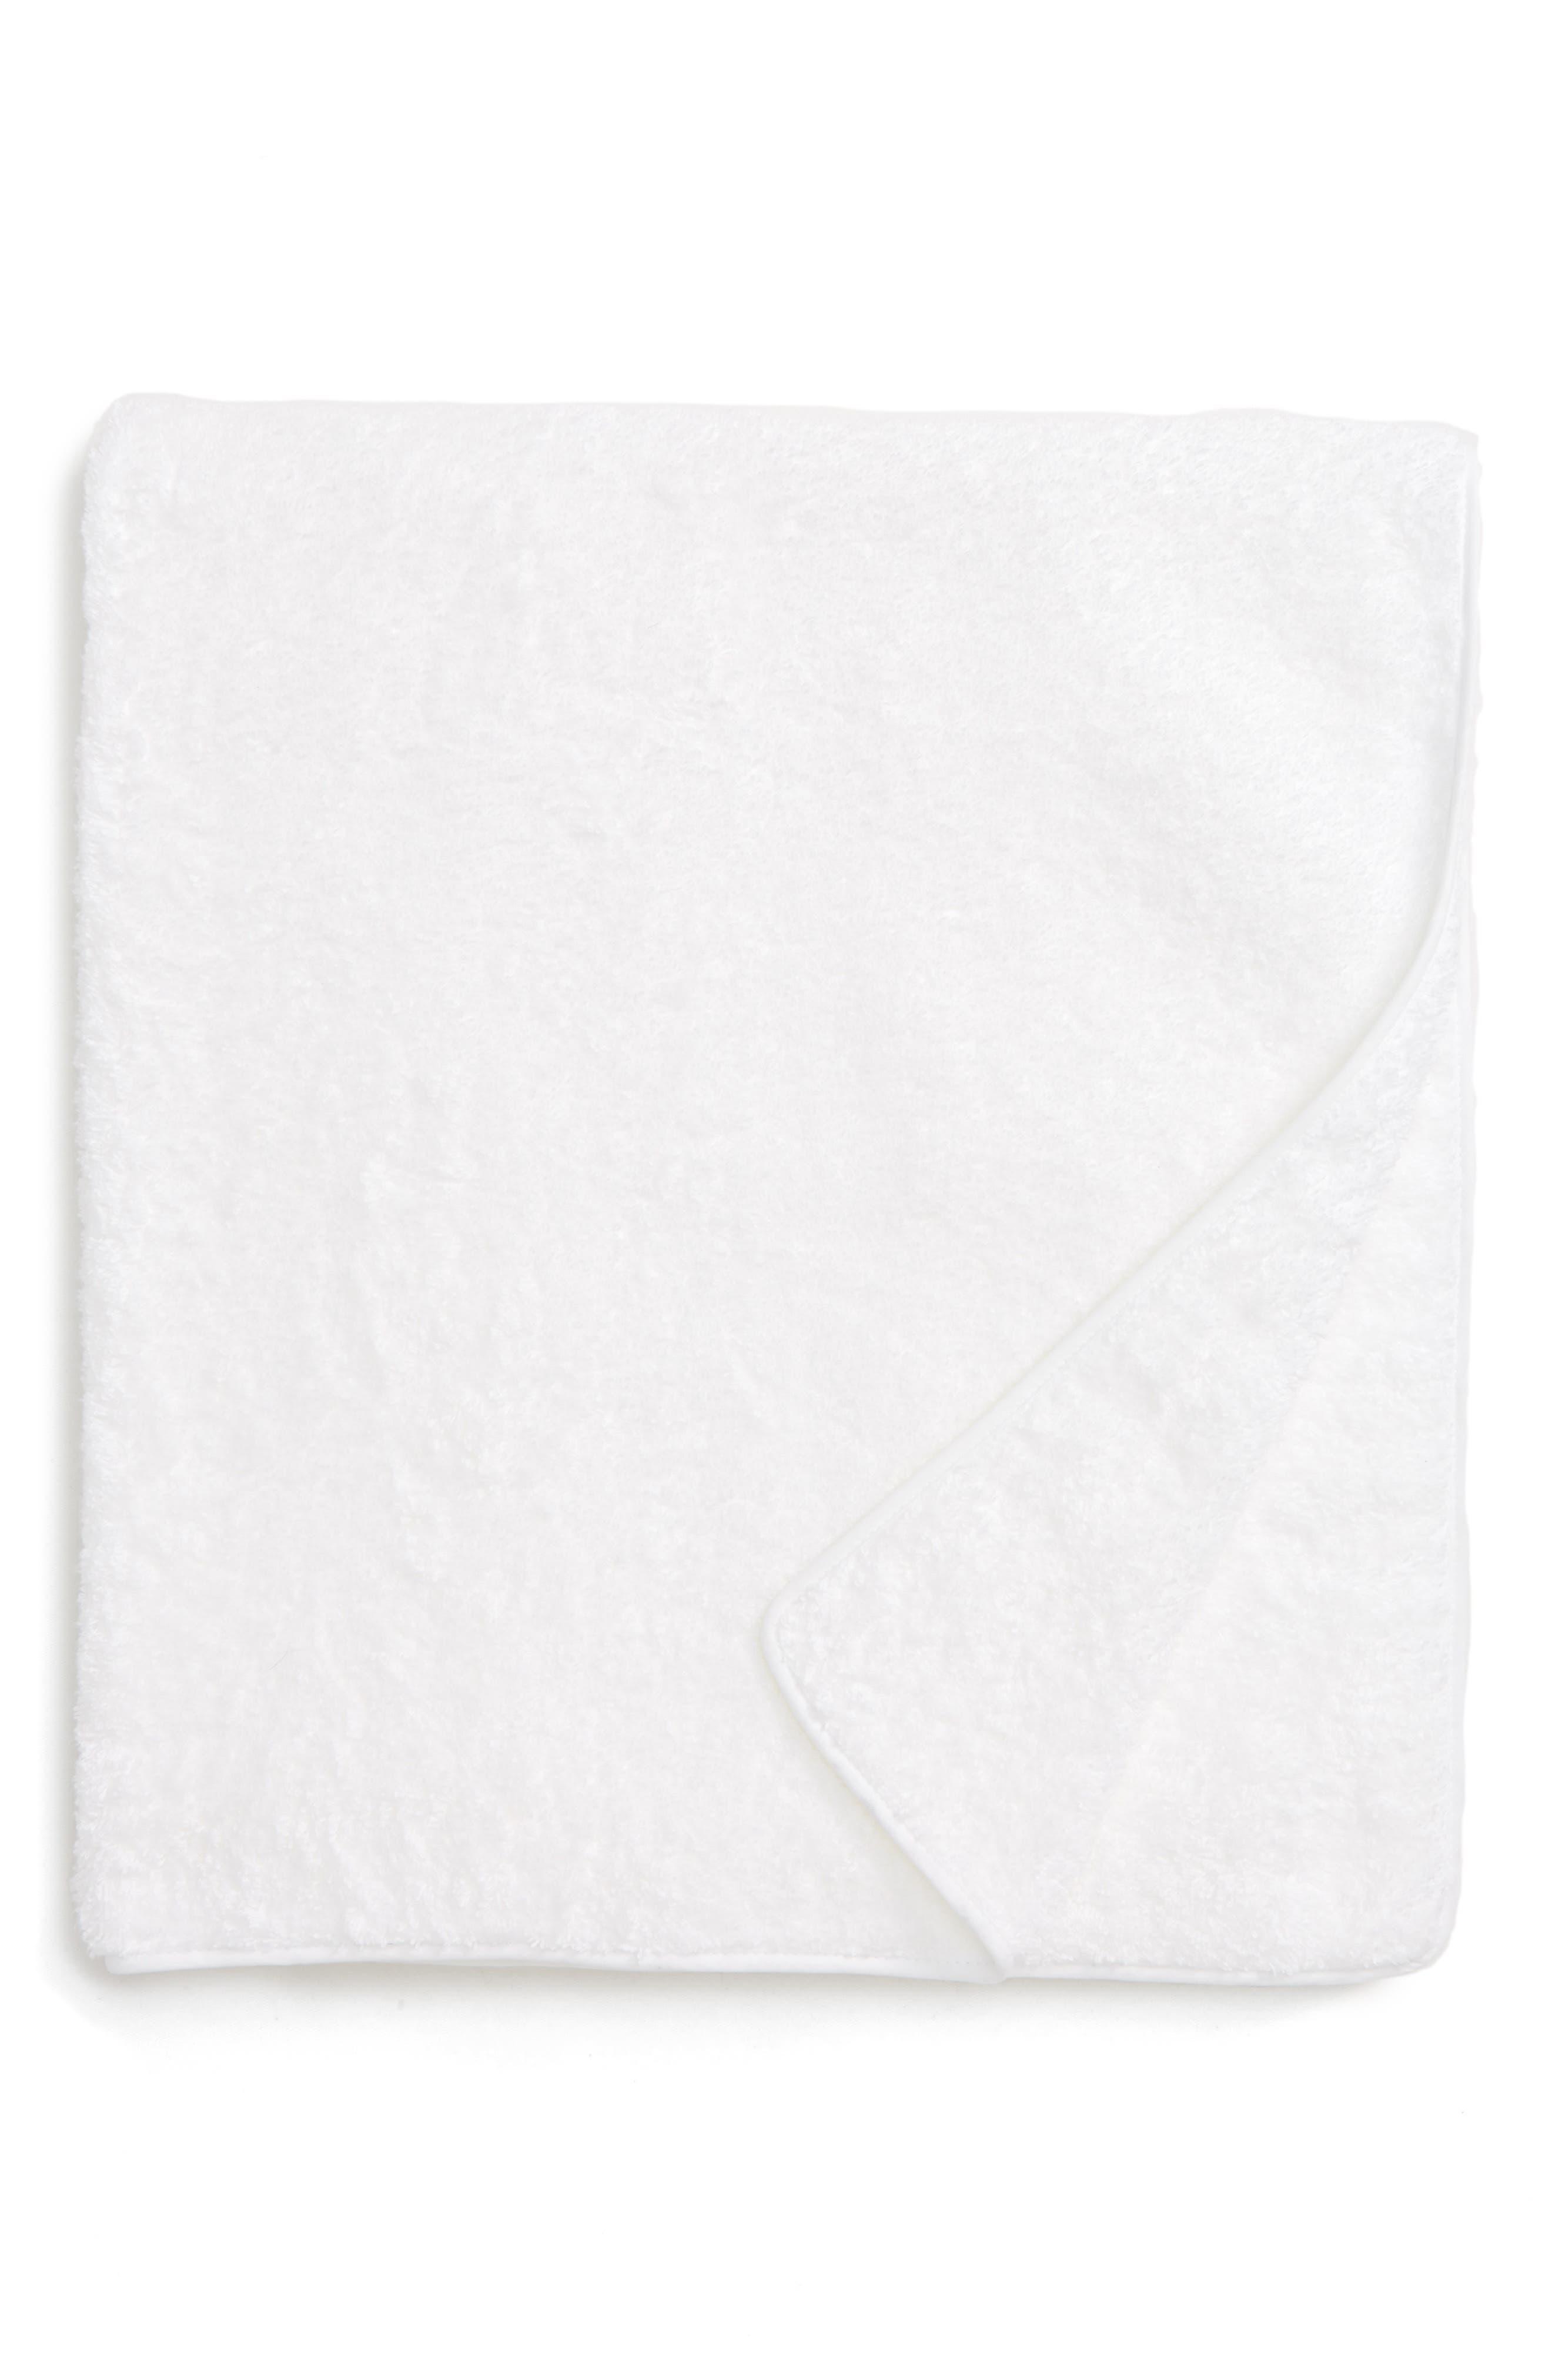 Alternate Image 1 Selected - Matouk Cairo Bath Towel